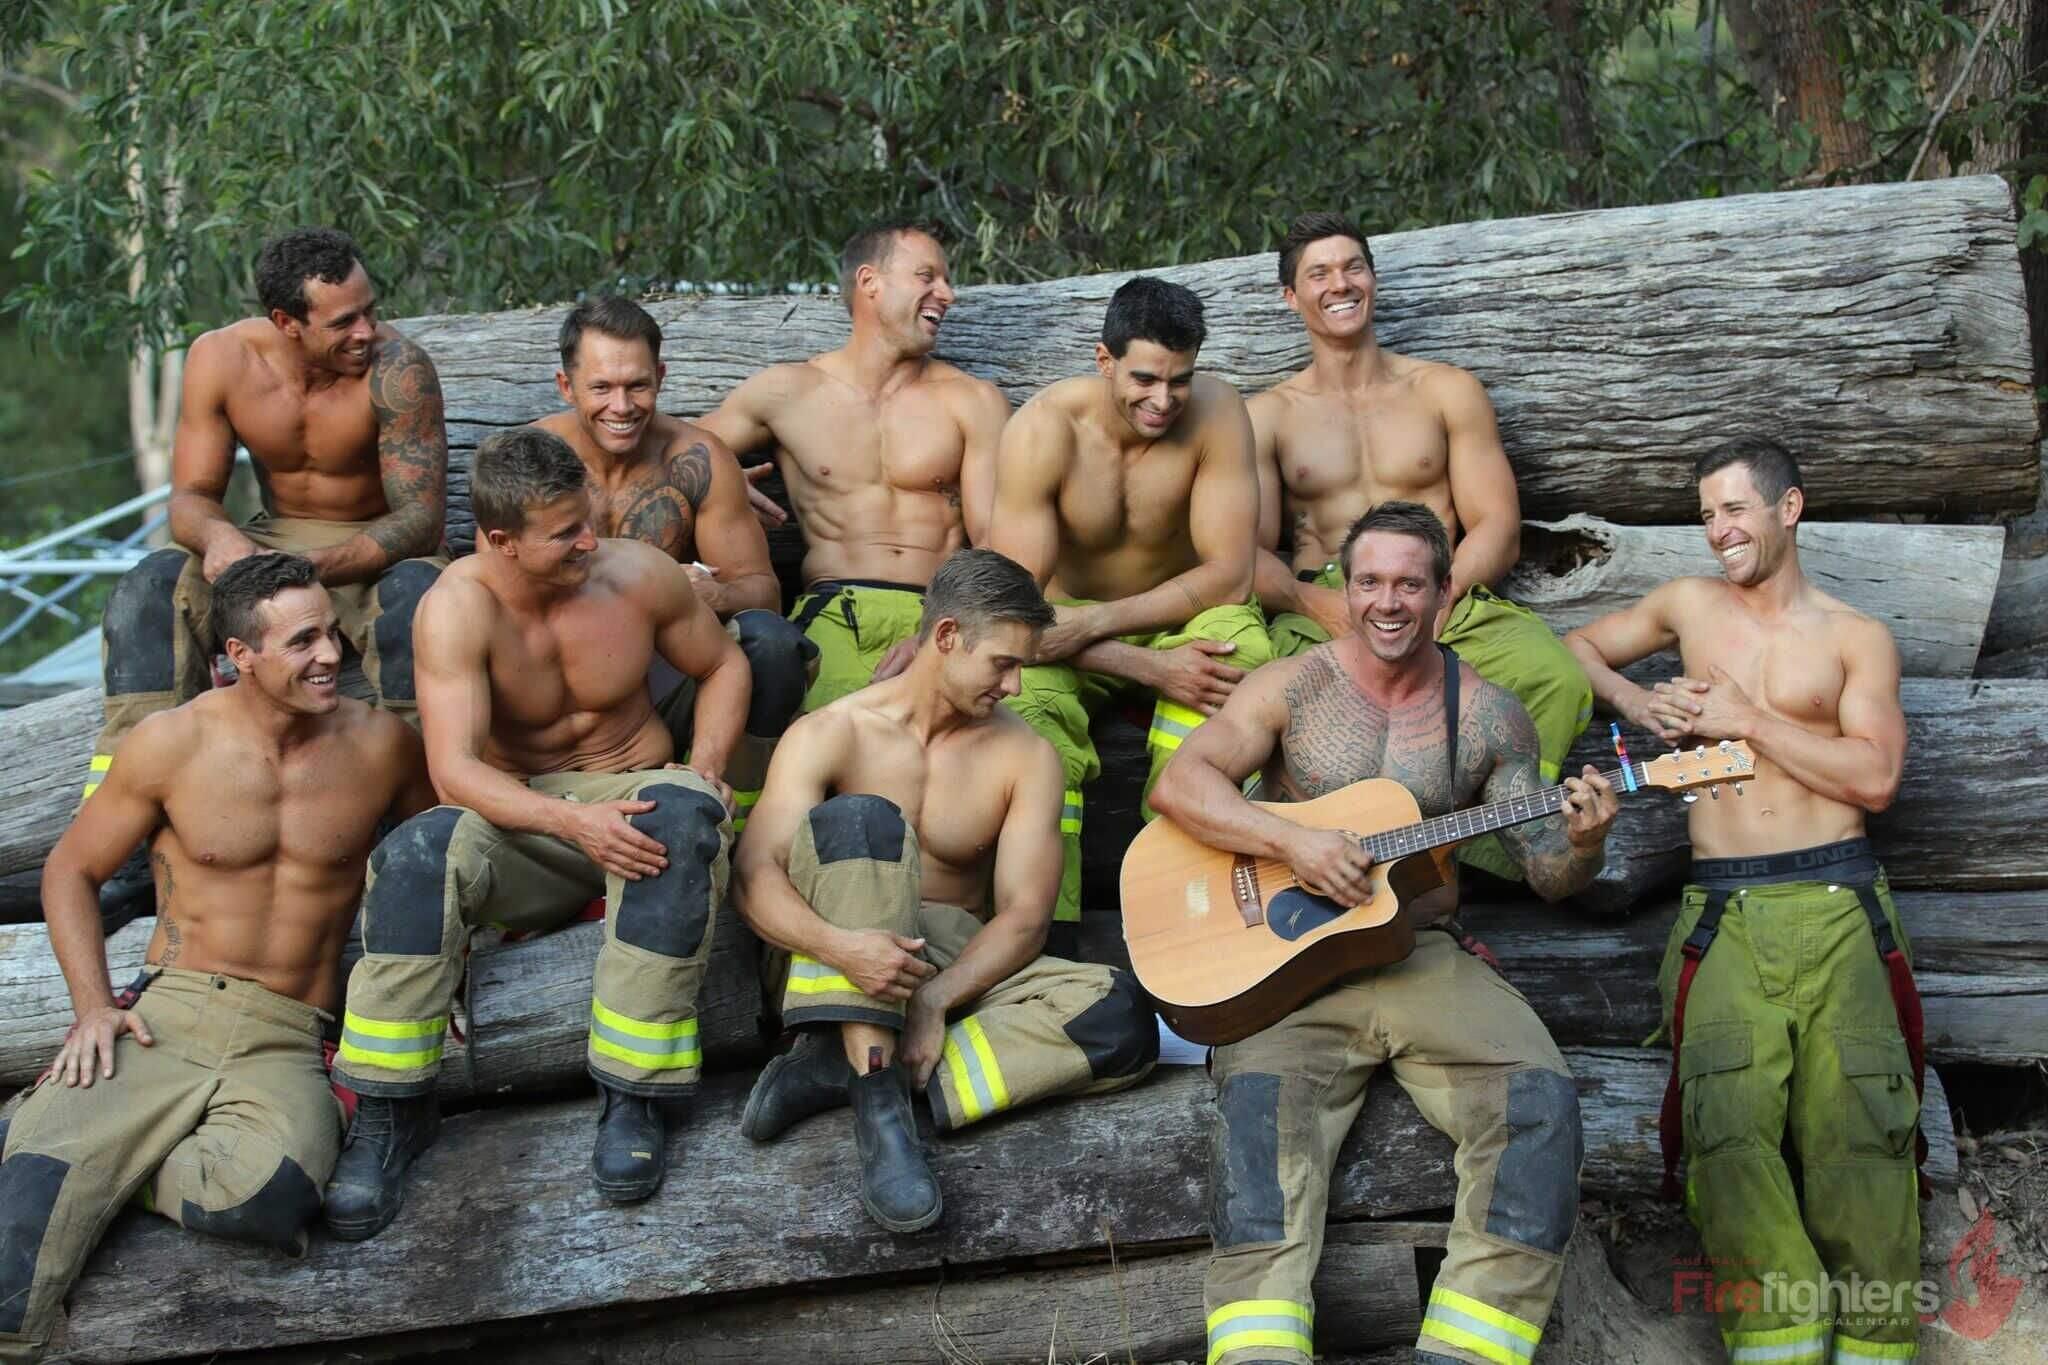 Il calendario 2019 dei pompieri australiani